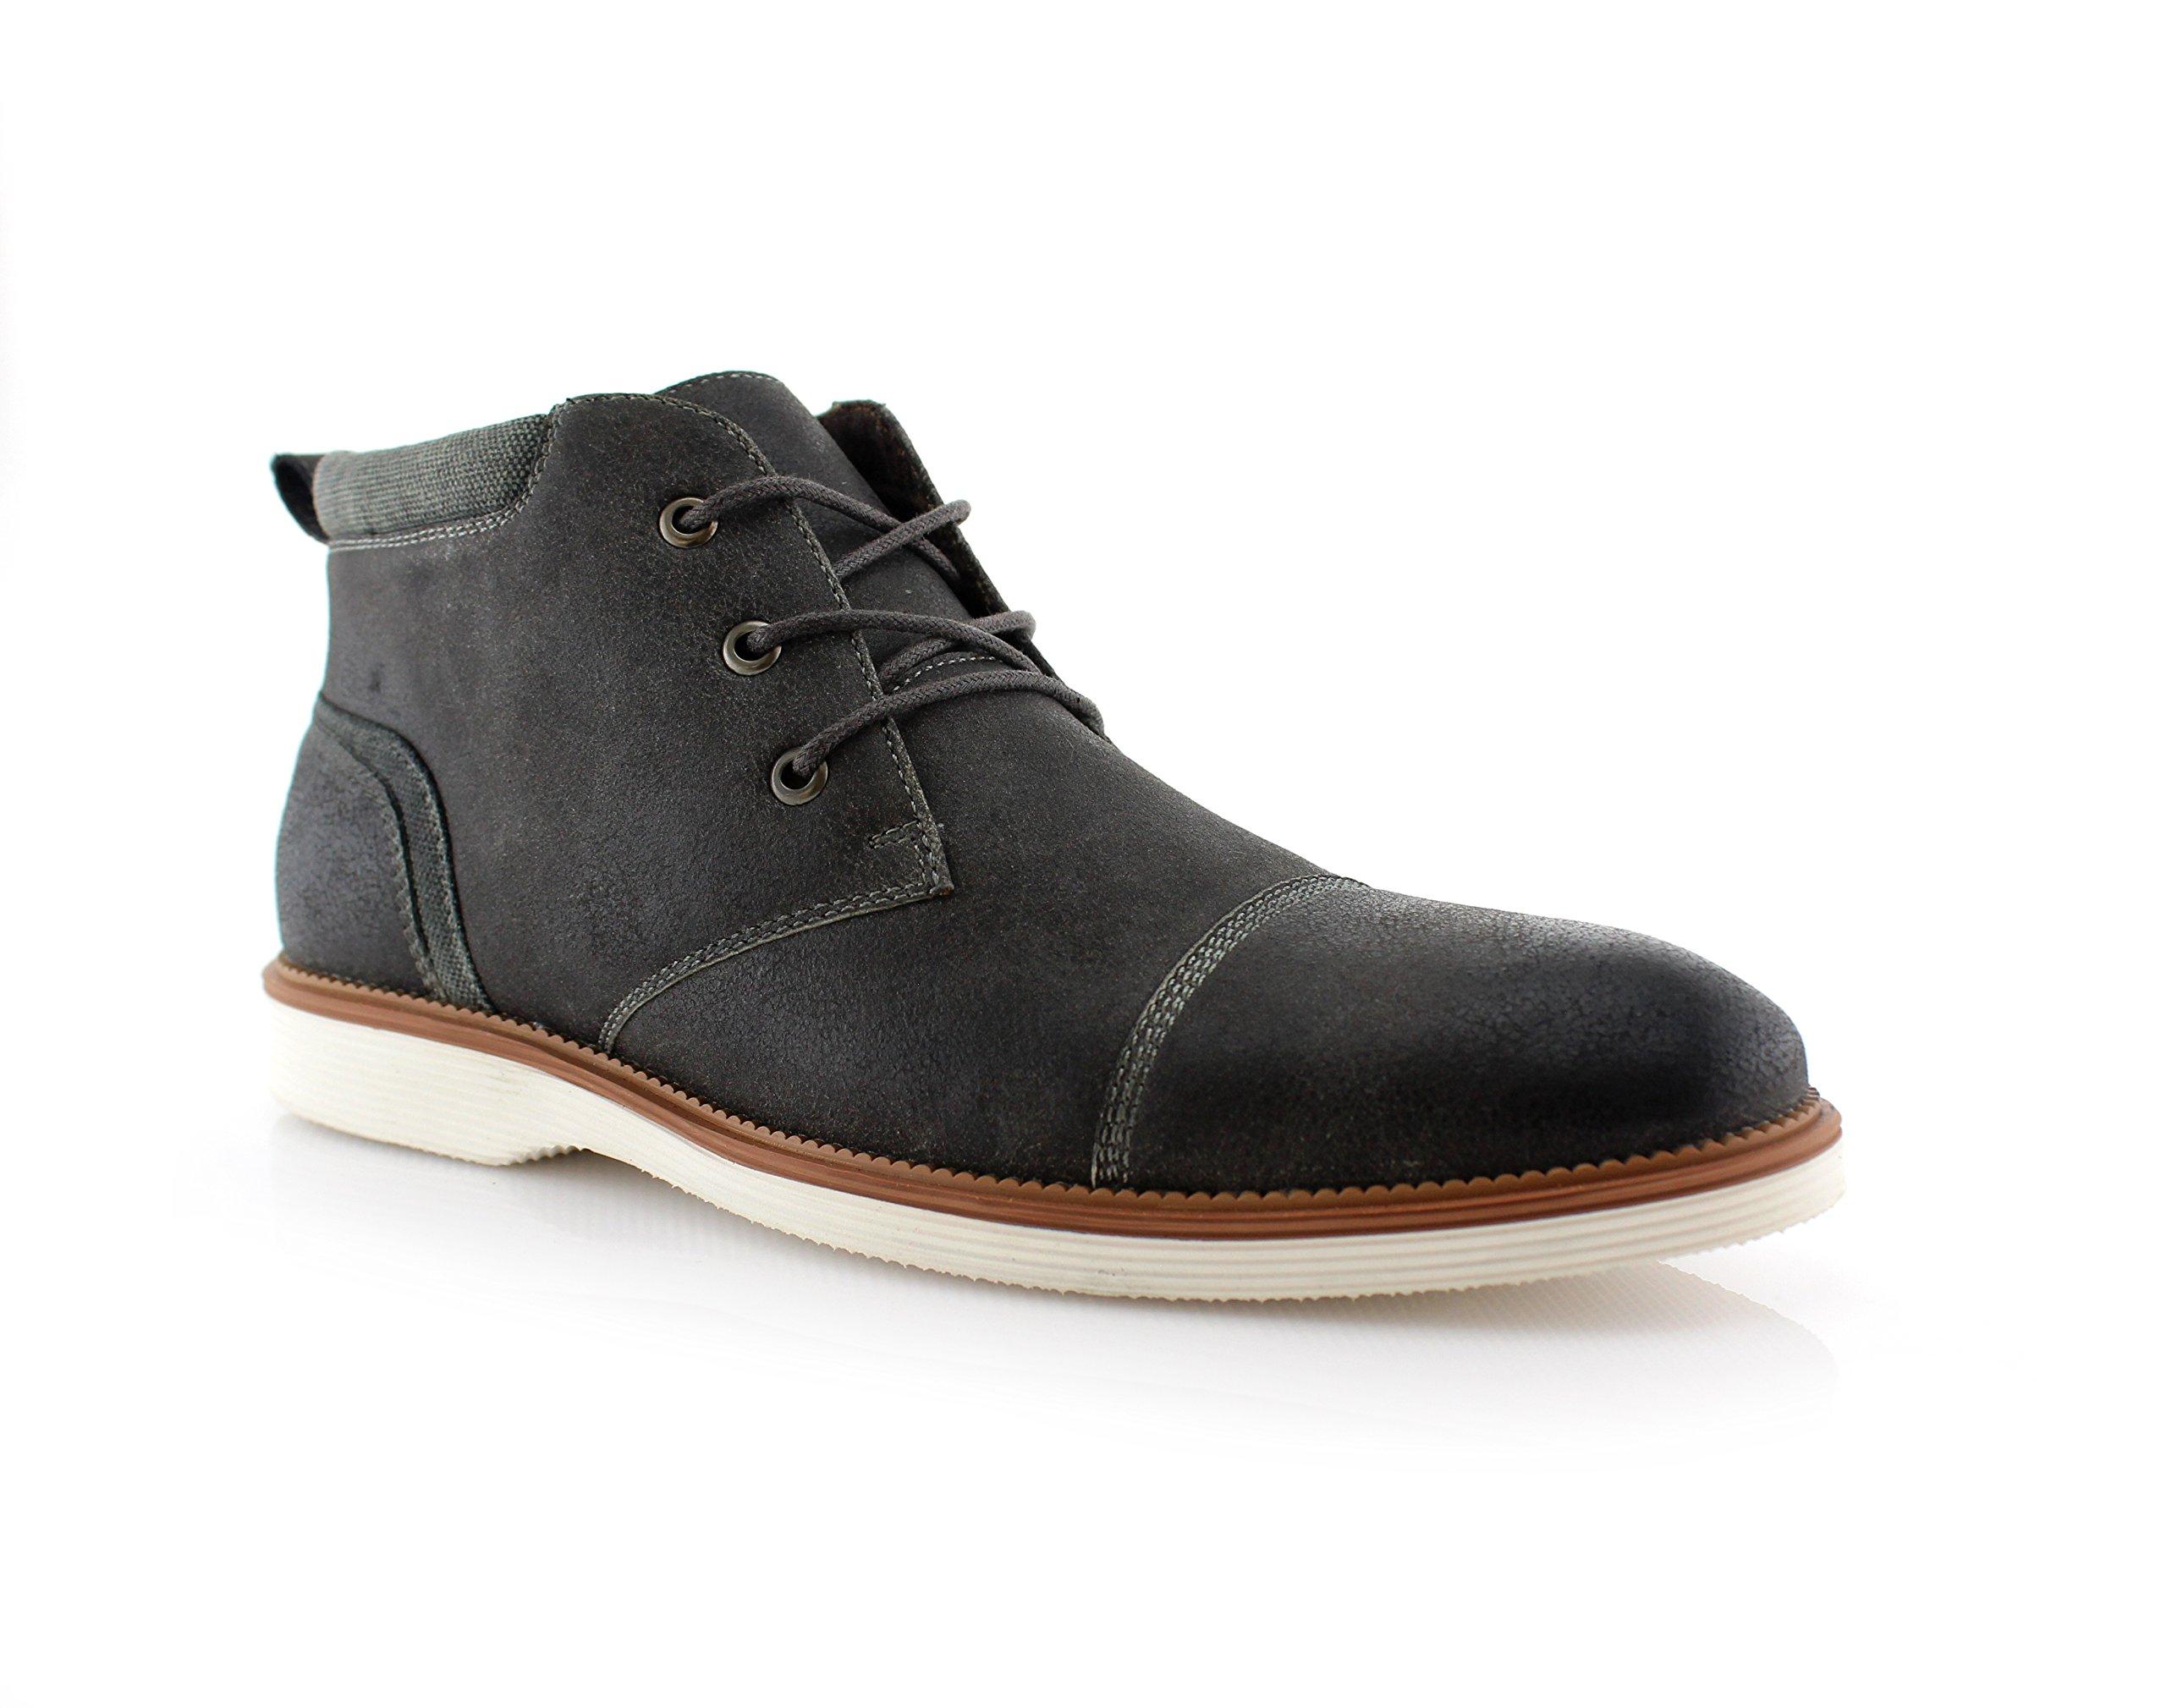 Ferro Aldo Sammy MFA506030 Mens Fashion Casual Mid-Top Sneaker Chukka Boots - Grey, Size 12